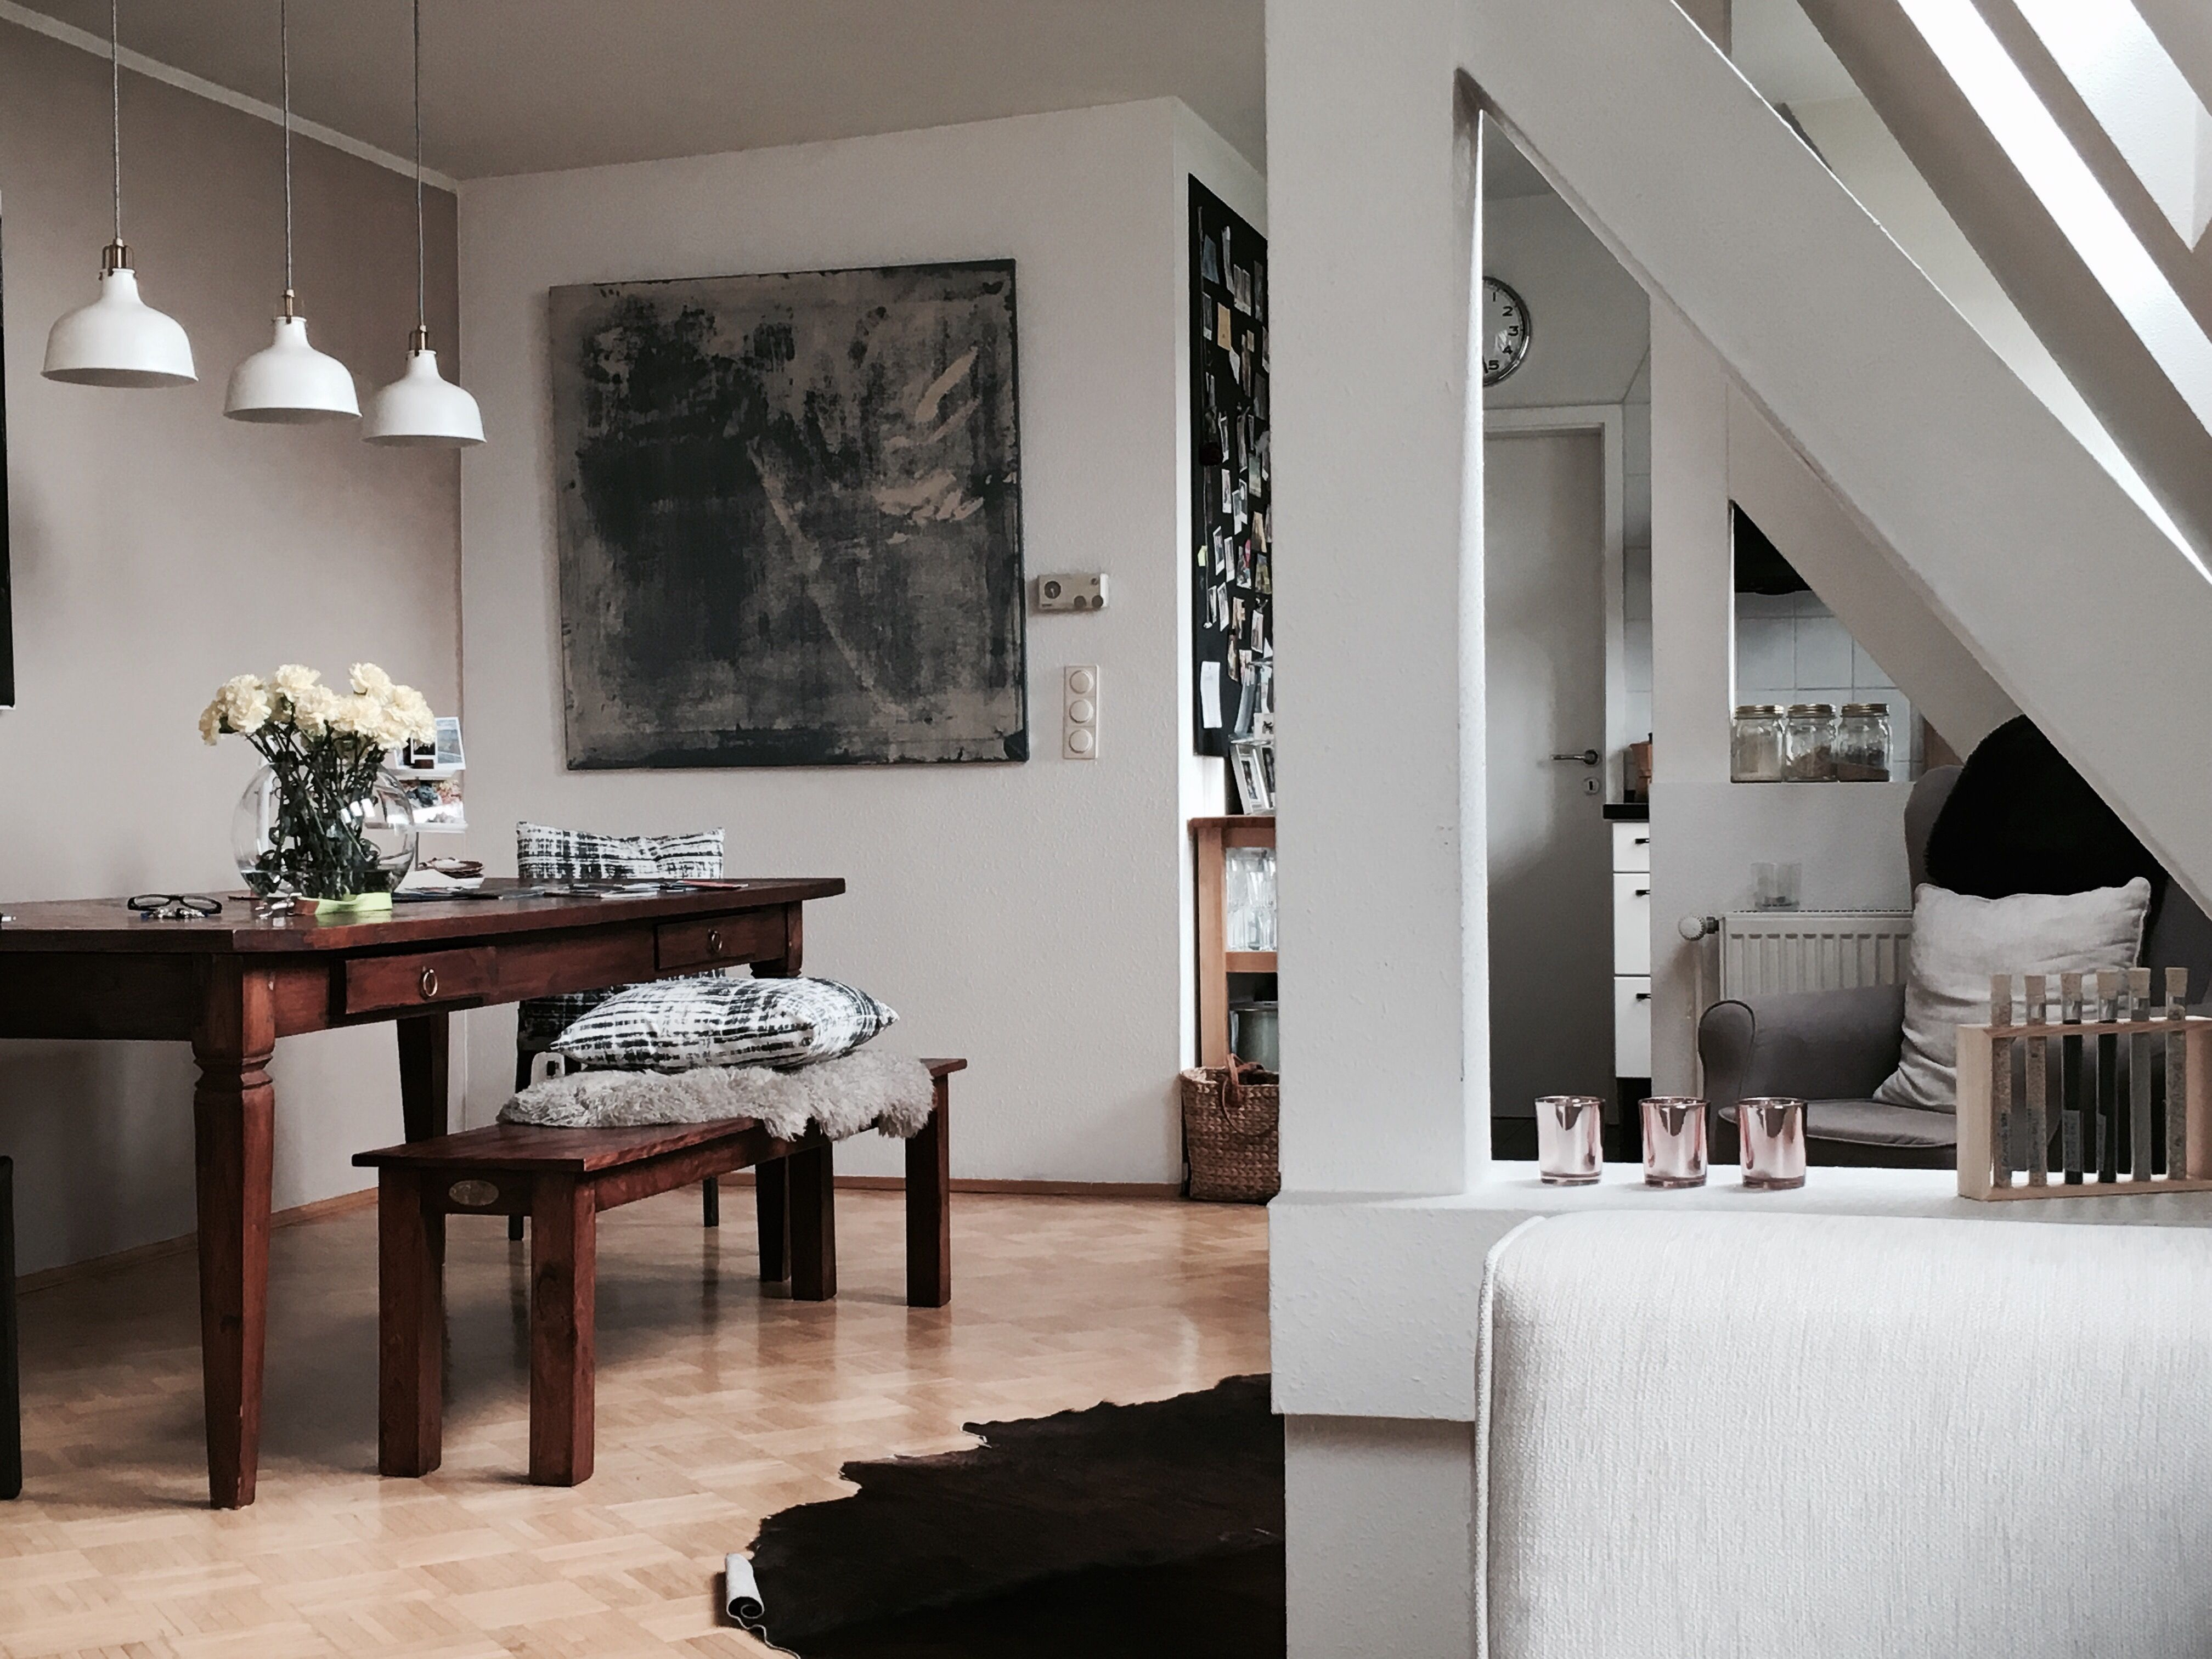 Esszimmer Hamburg hamburg germany airbnb wohnung livingroom flat interior